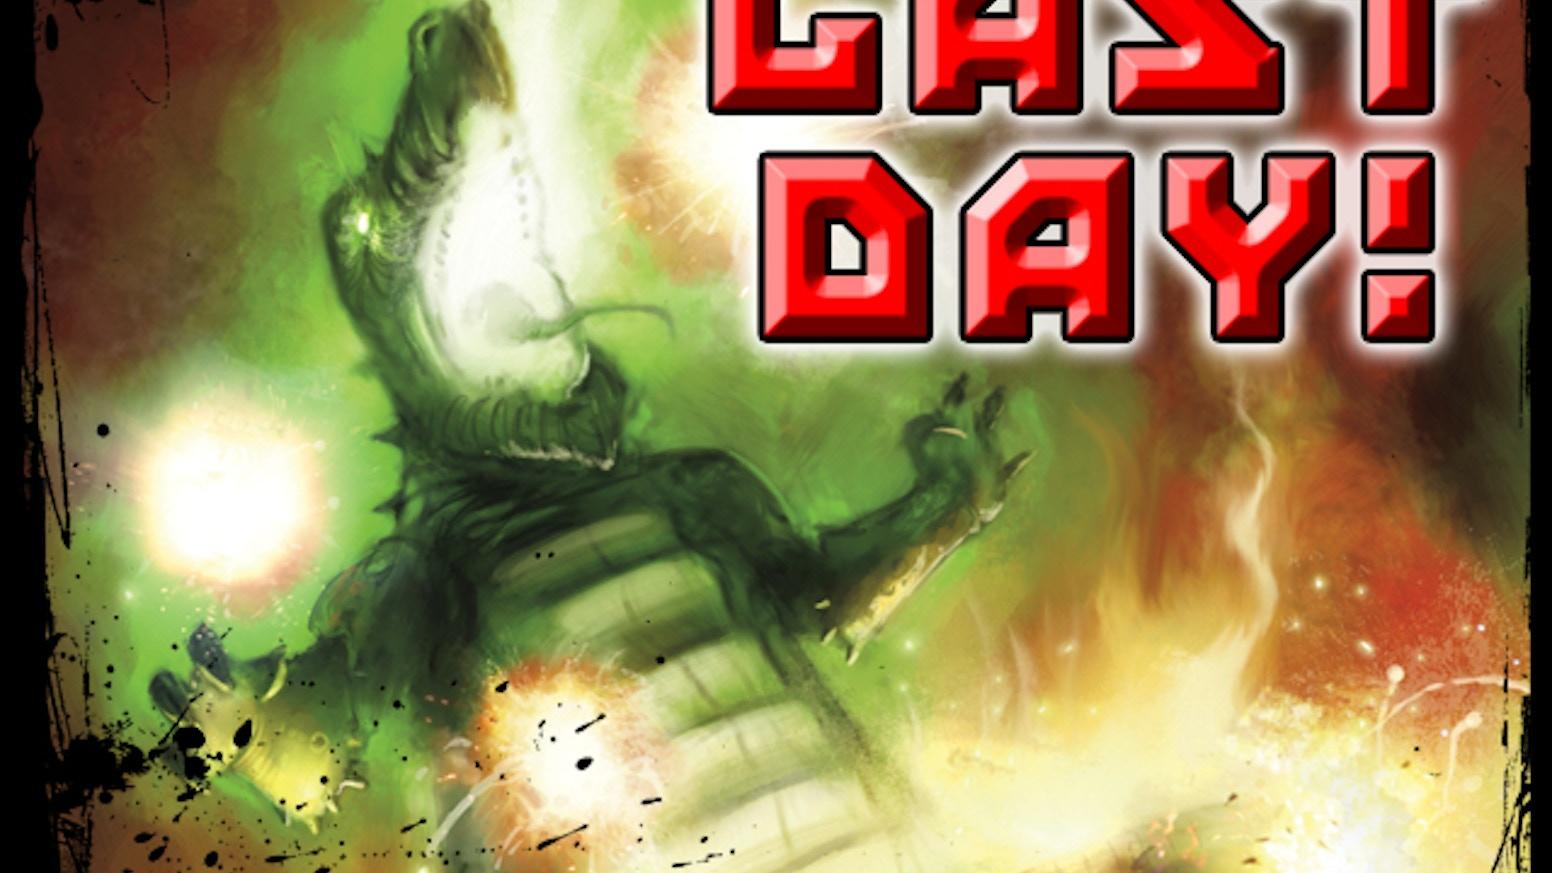 What if Doctor Strangelove created Godzilla?